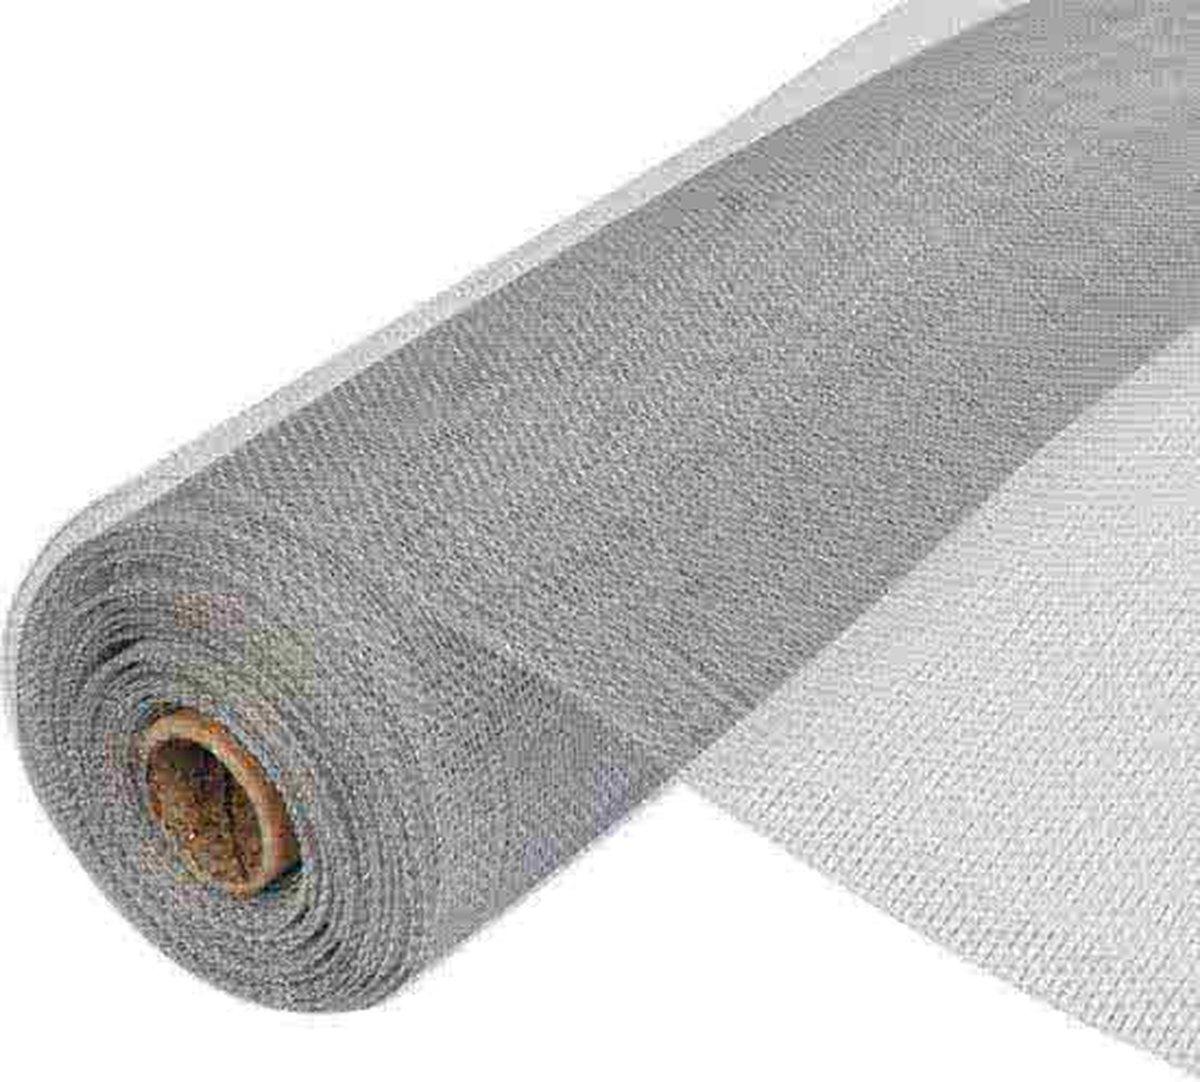 Aluminium horrengaas 0,6x30m (maaswijdte 18x16) - Schadébo Professioneel